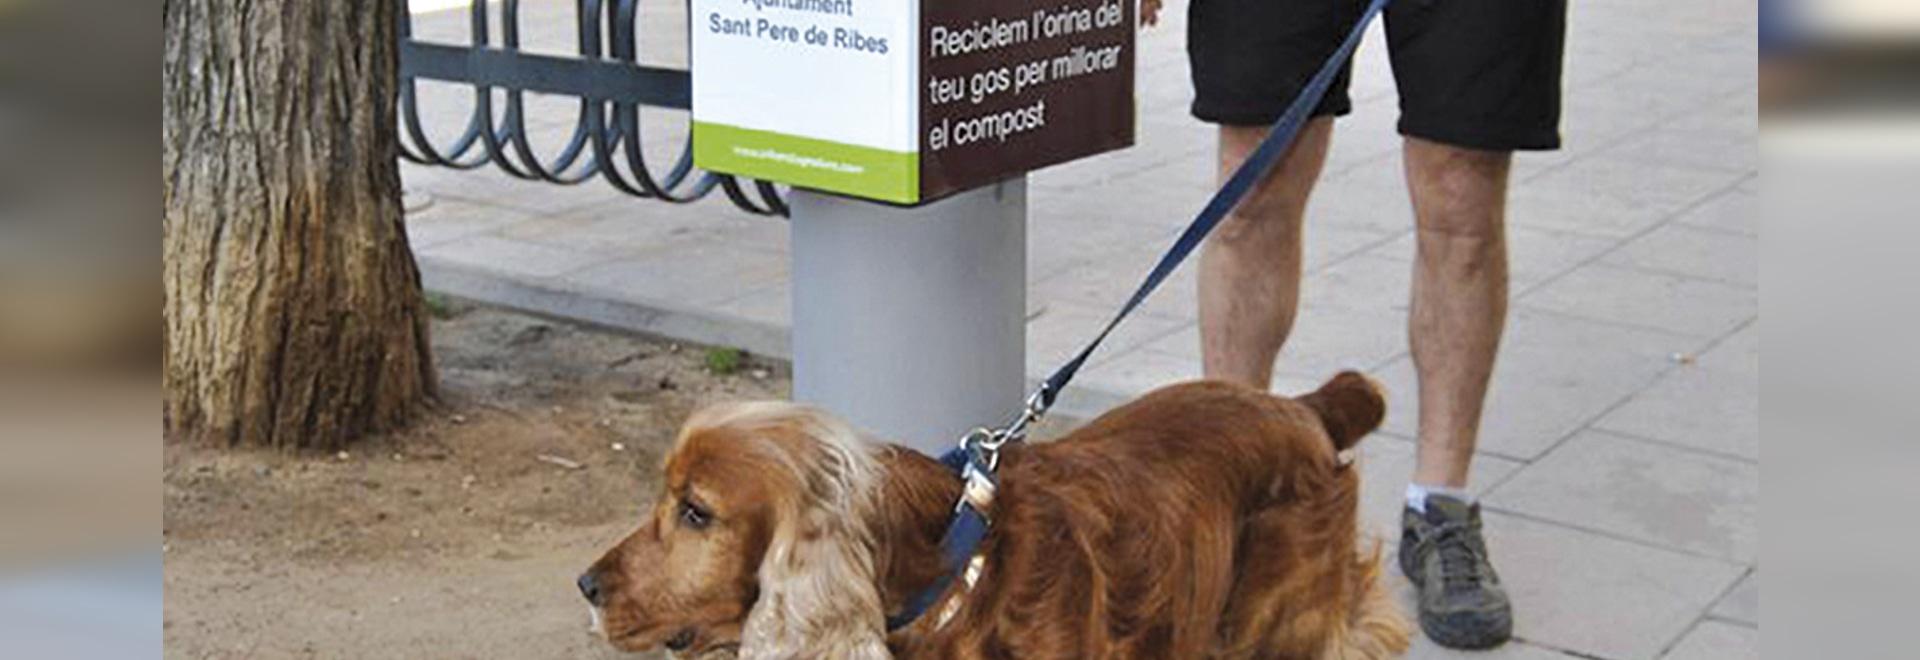 El colector urbano de la orina del perro instaló